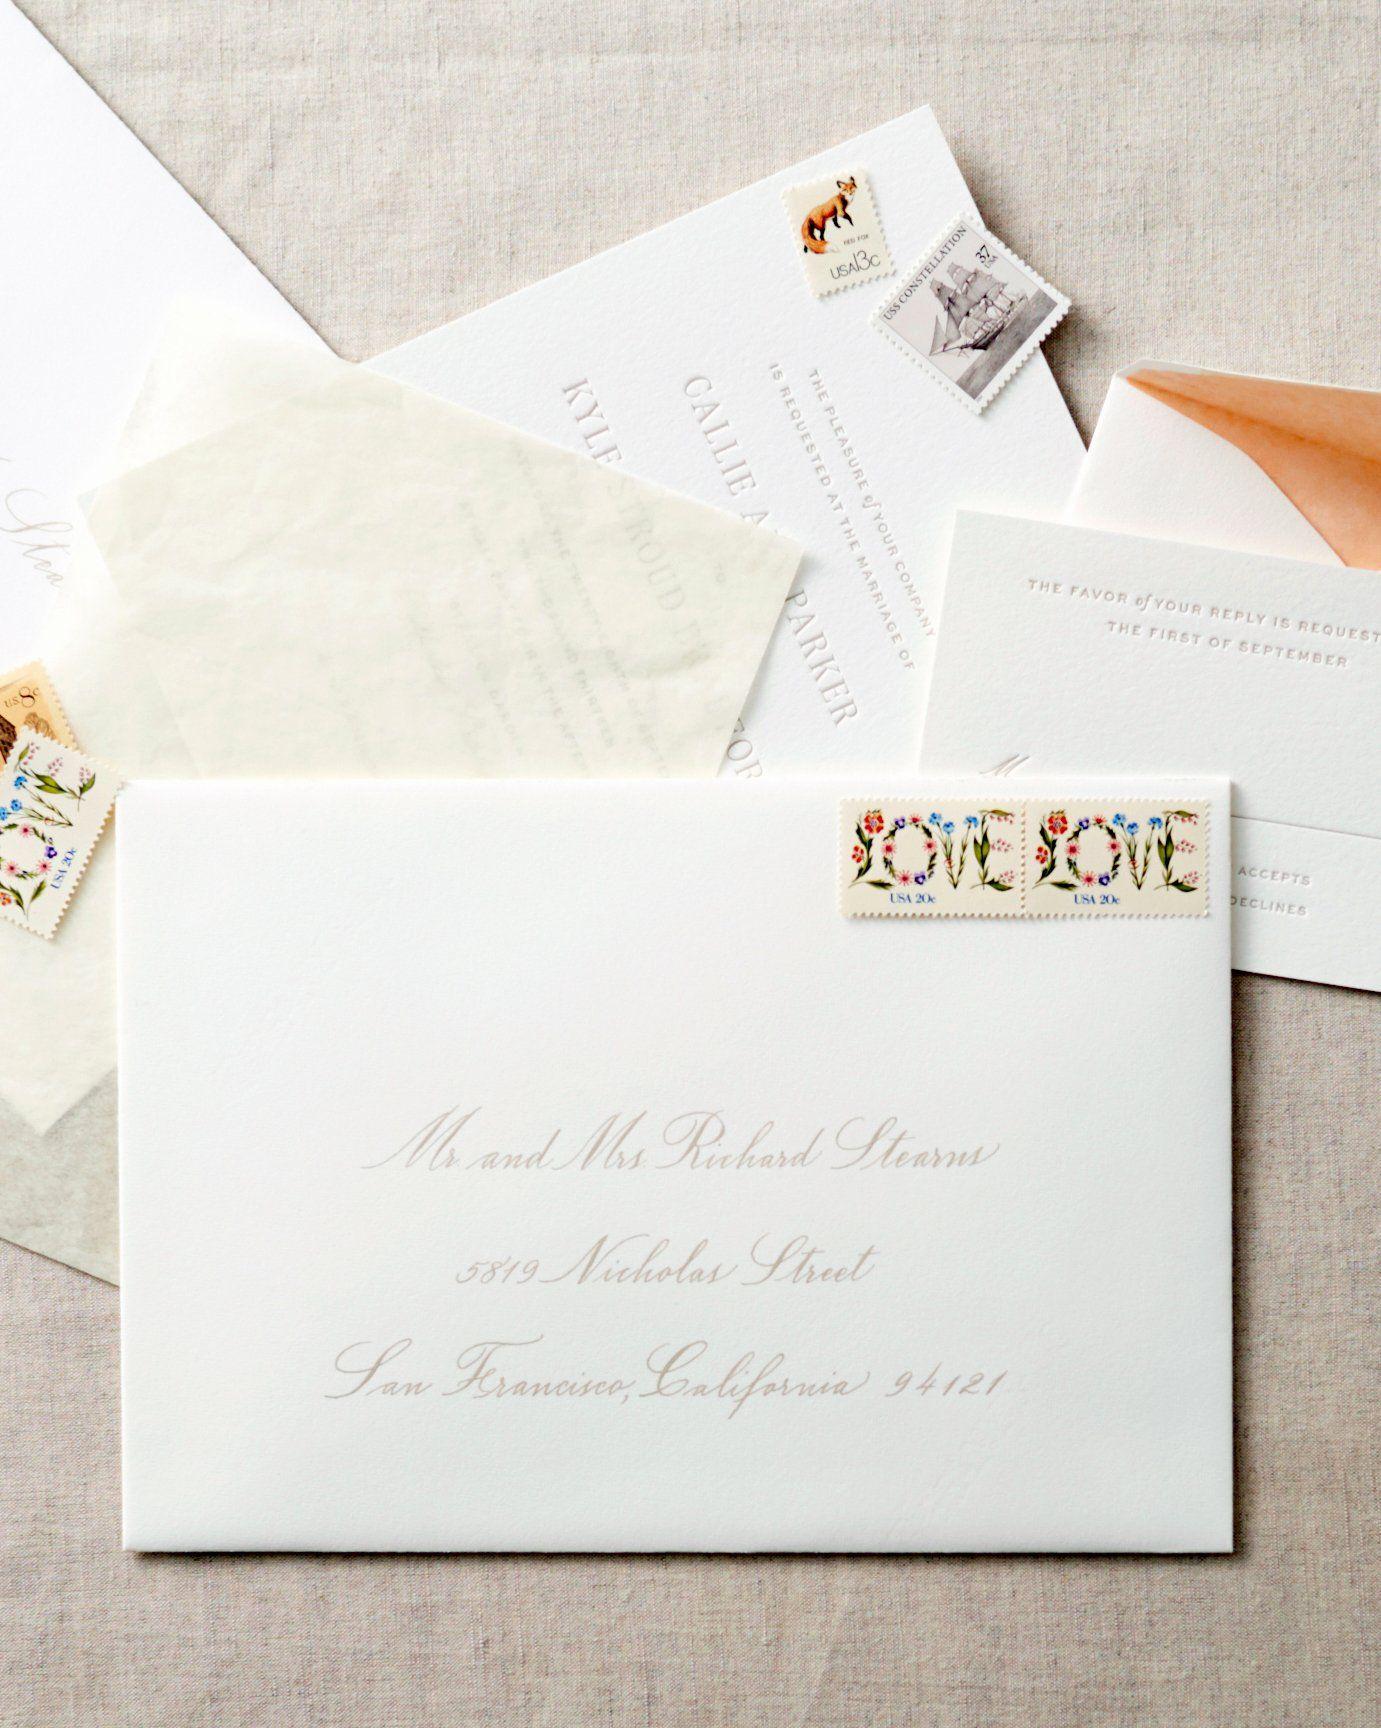 Wedding Invitation Inner Envelope Inspirational 10 Things You Shou In 2020 Hand Lettered Wedding Invitations Wedding Invitation Envelopes Wedding Reception Invitations